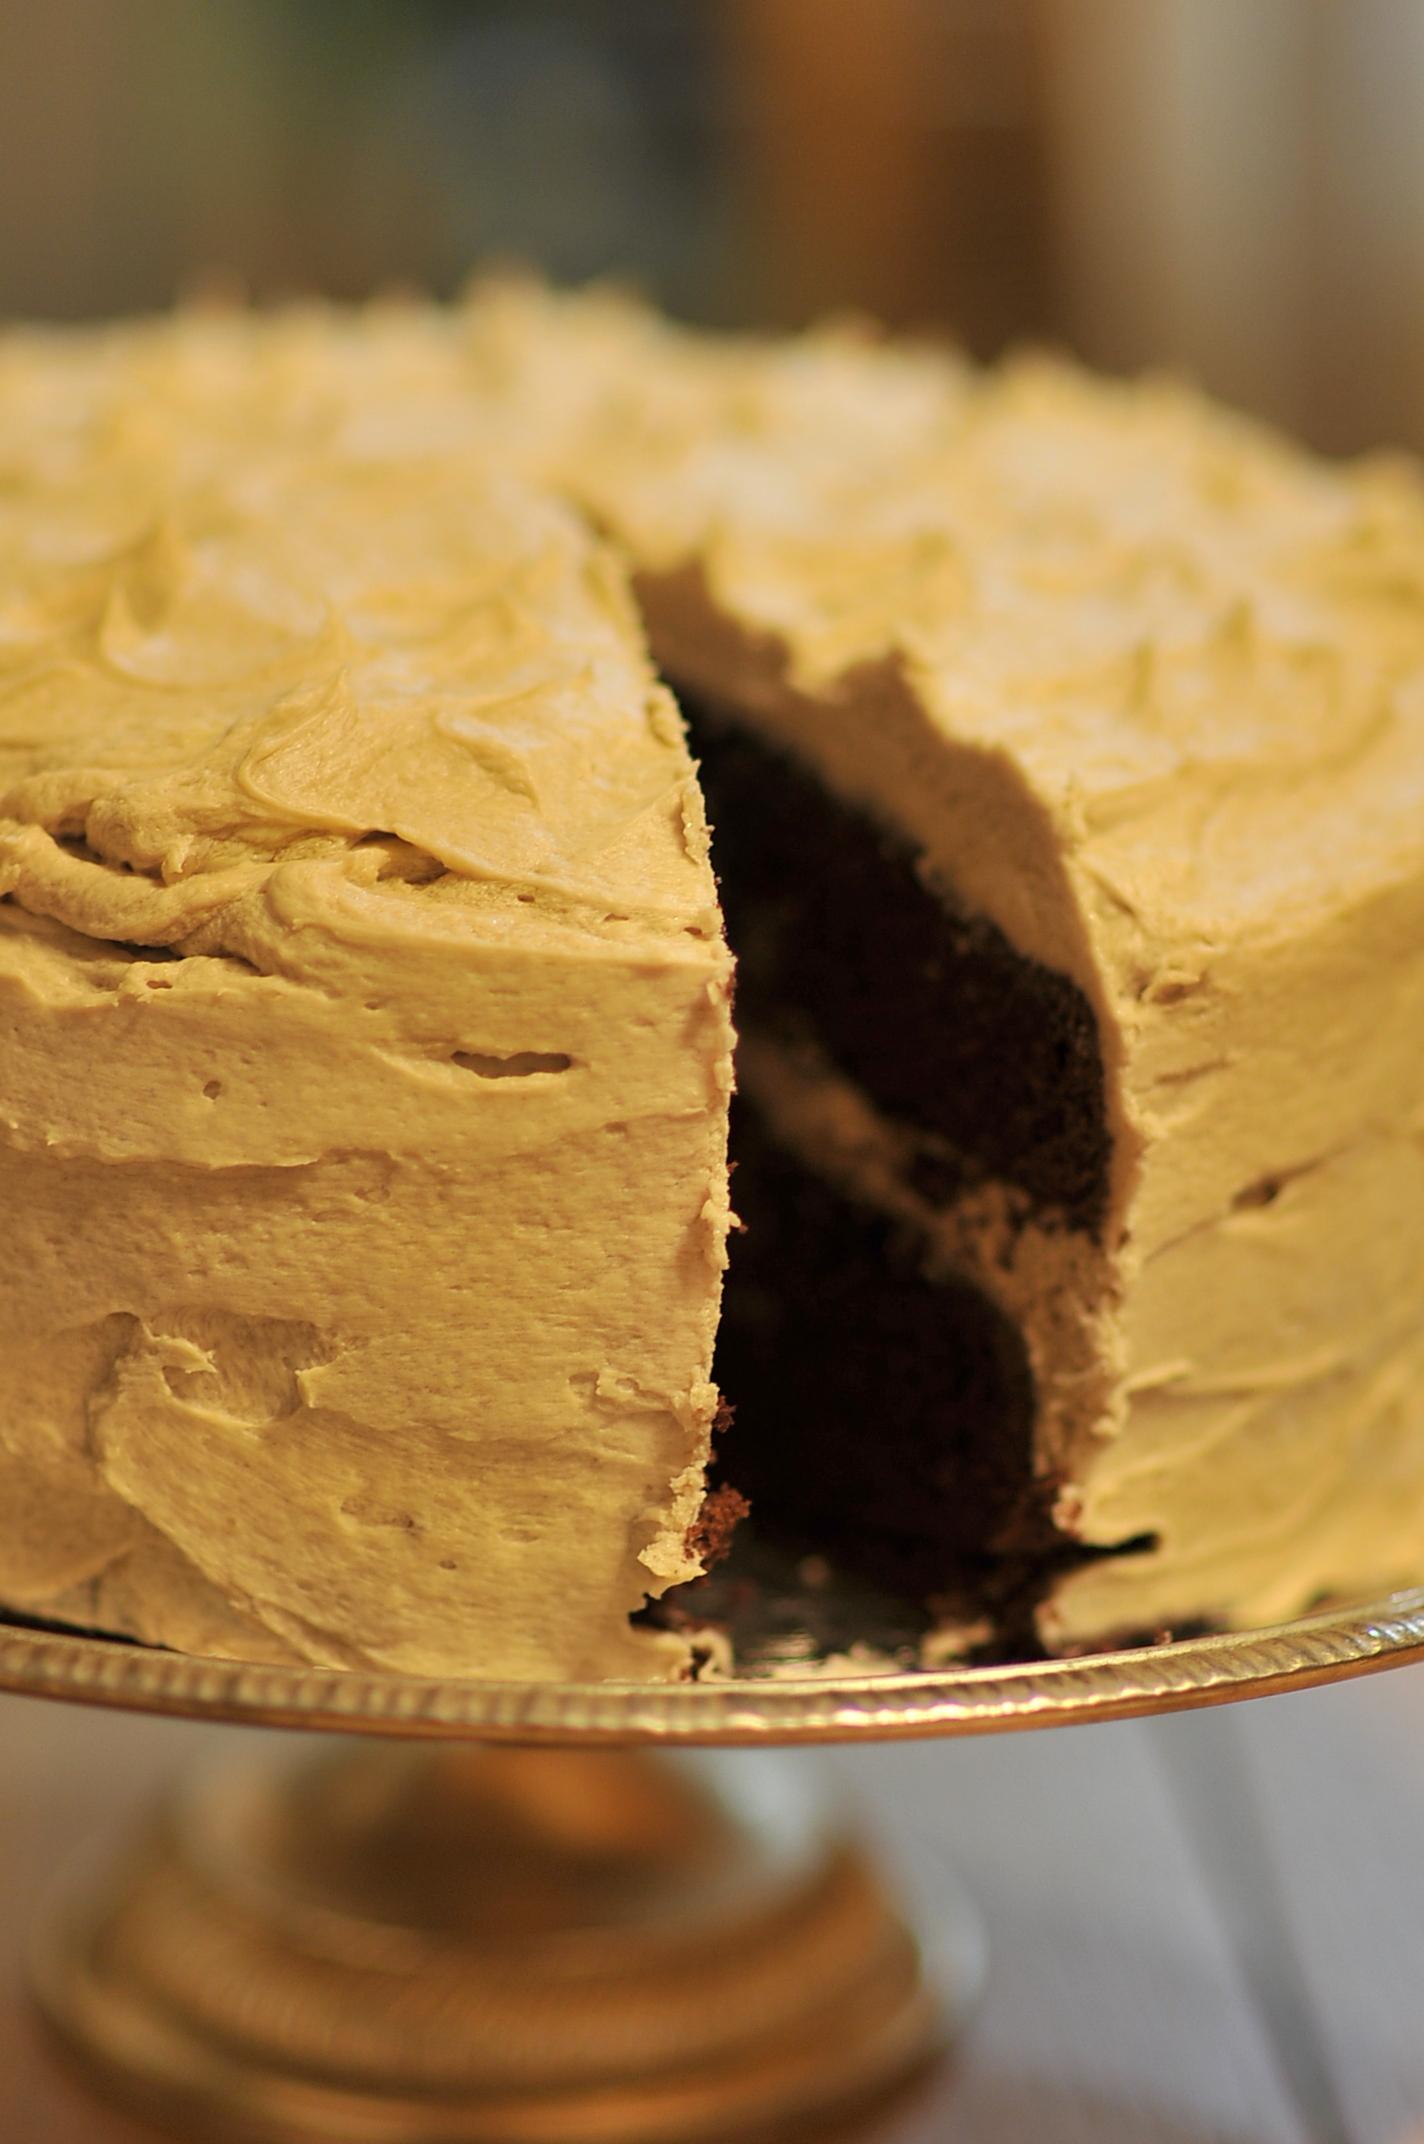 Six minute chocolate cake recipe